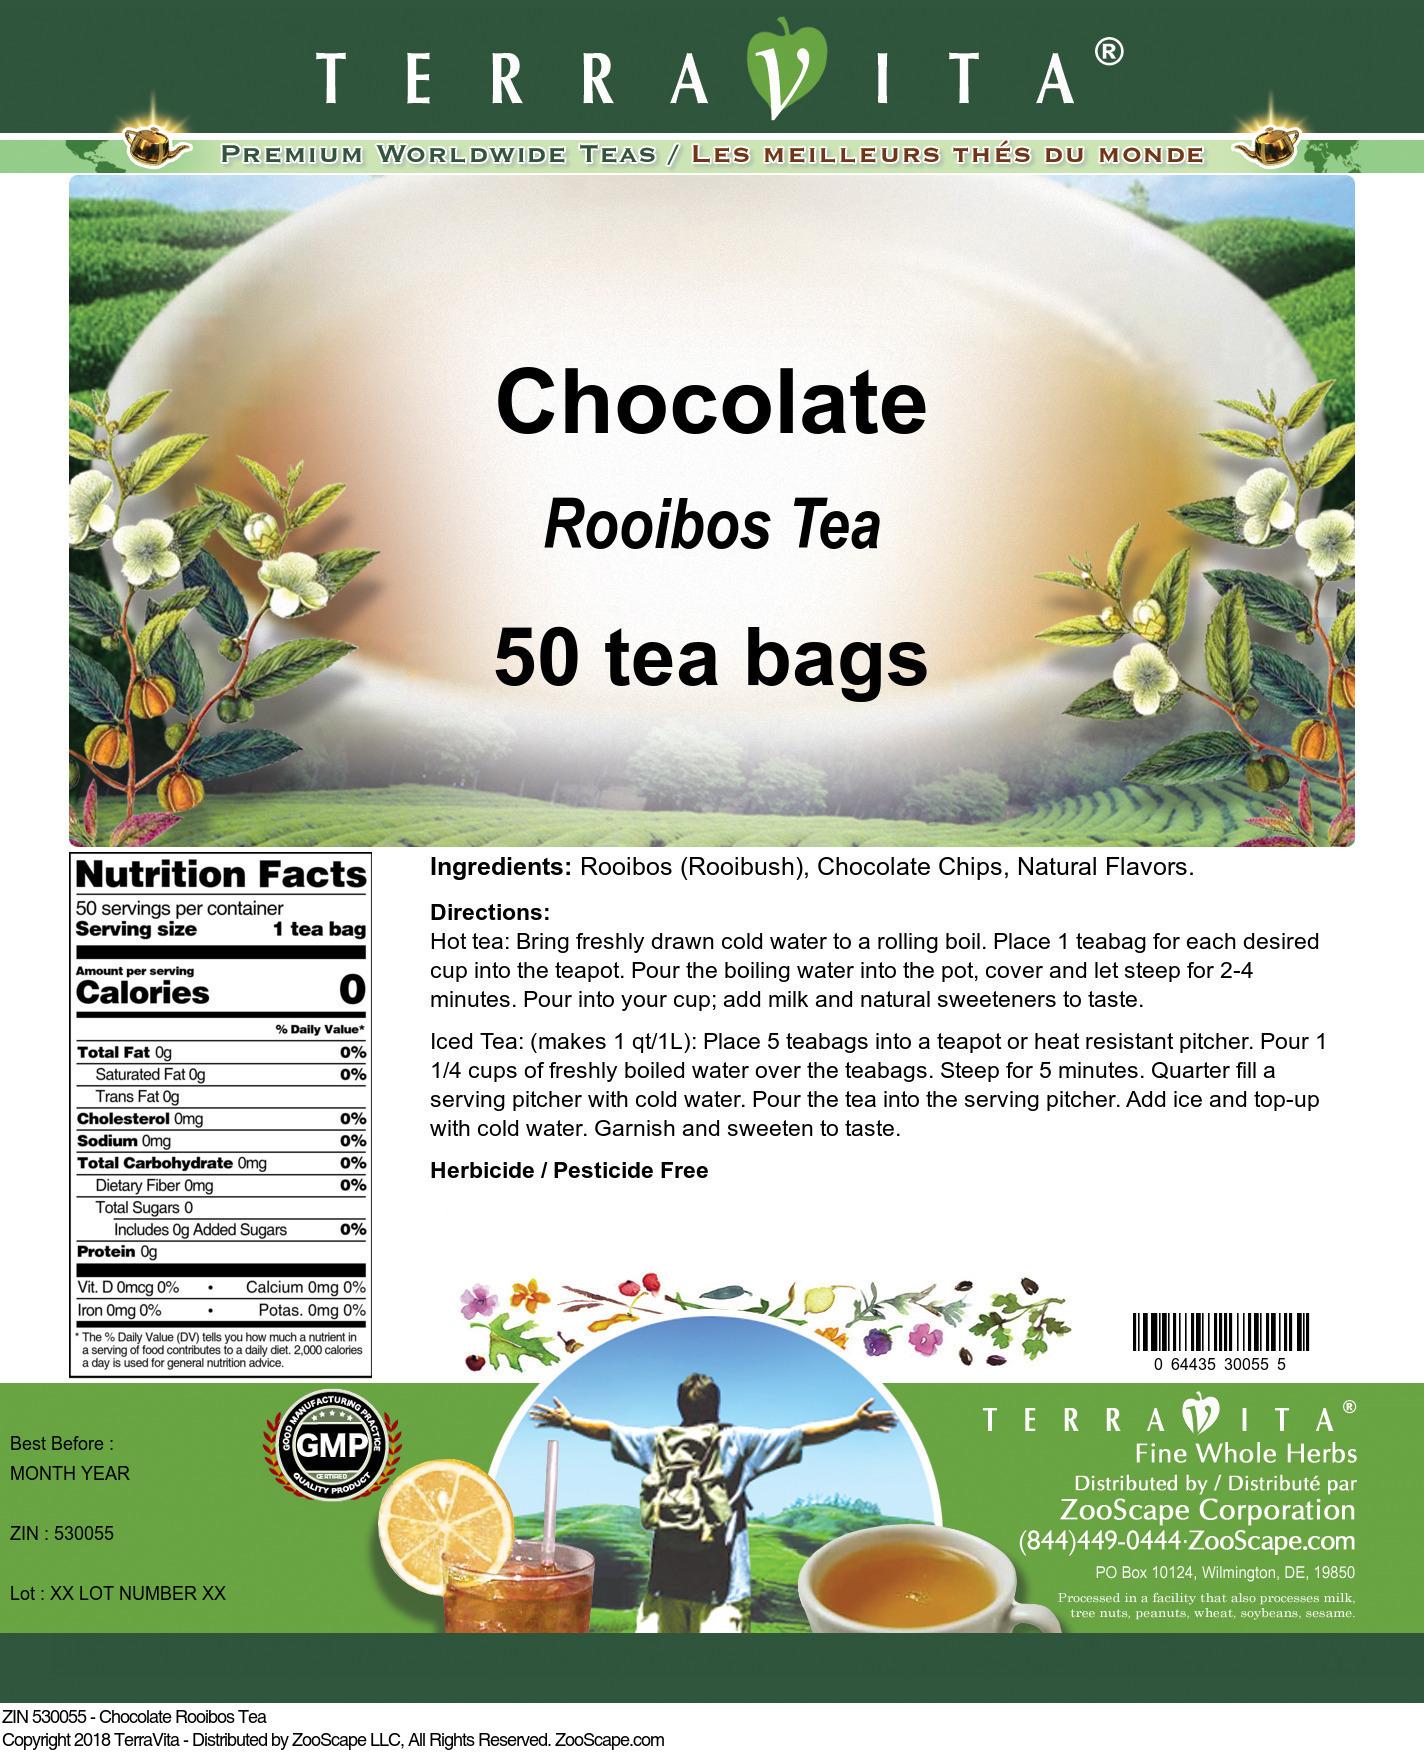 Chocolate Rooibos Tea